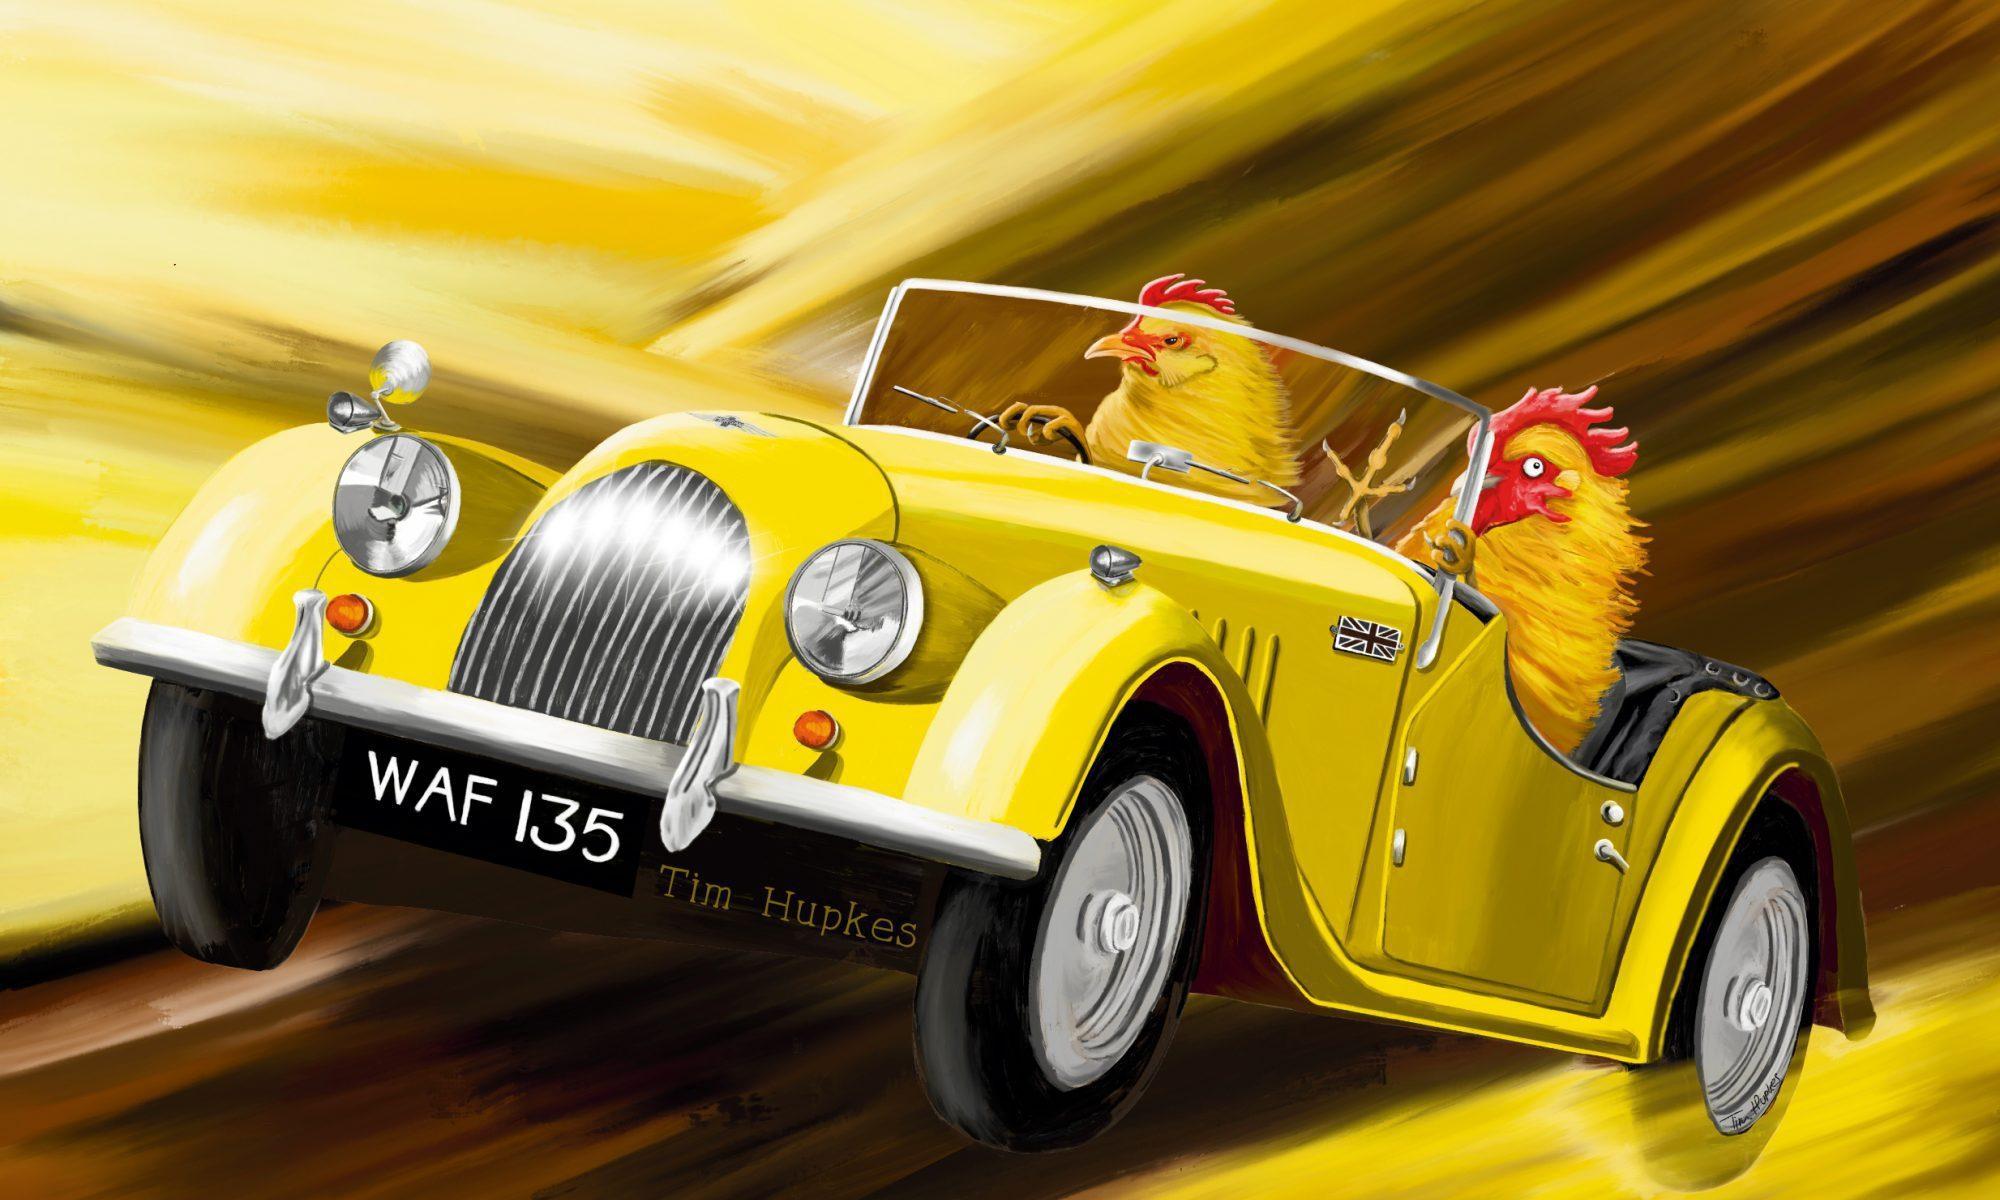 Fearless (yellow Morgan Plus 4, 1956)